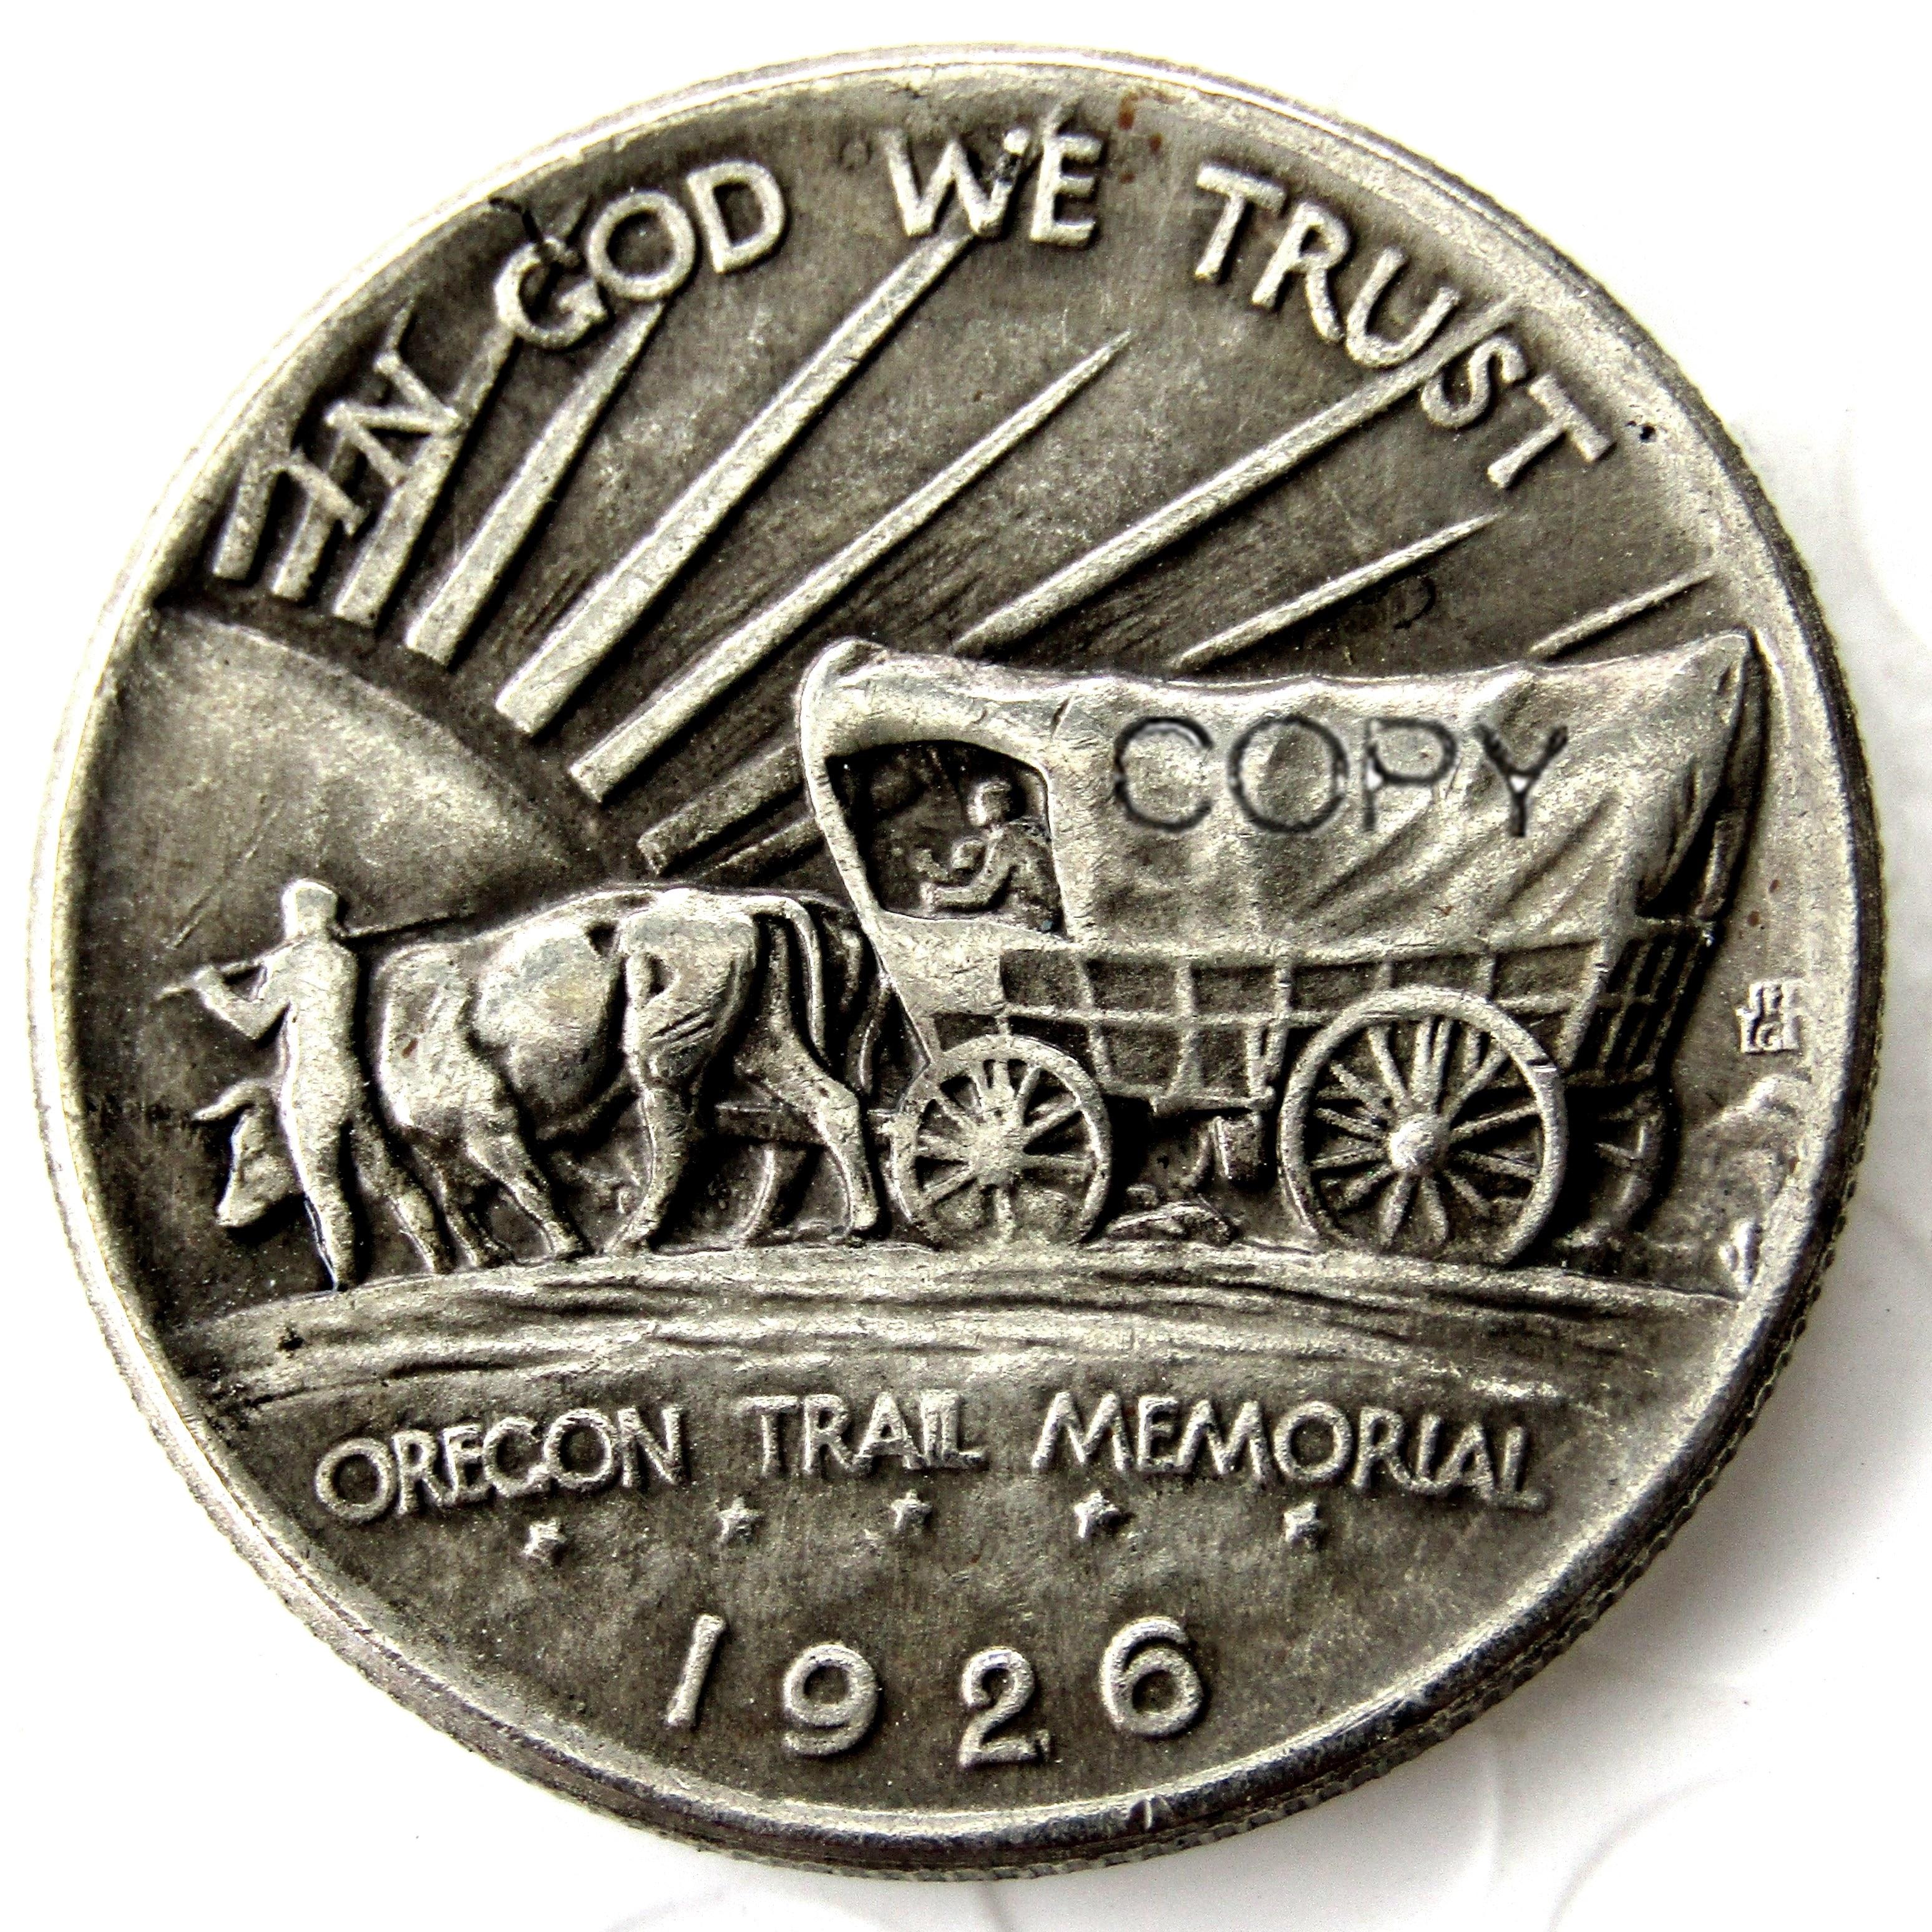 США 1926-S Орегон Trail Memorial половина копия доллара монеты посеребренные